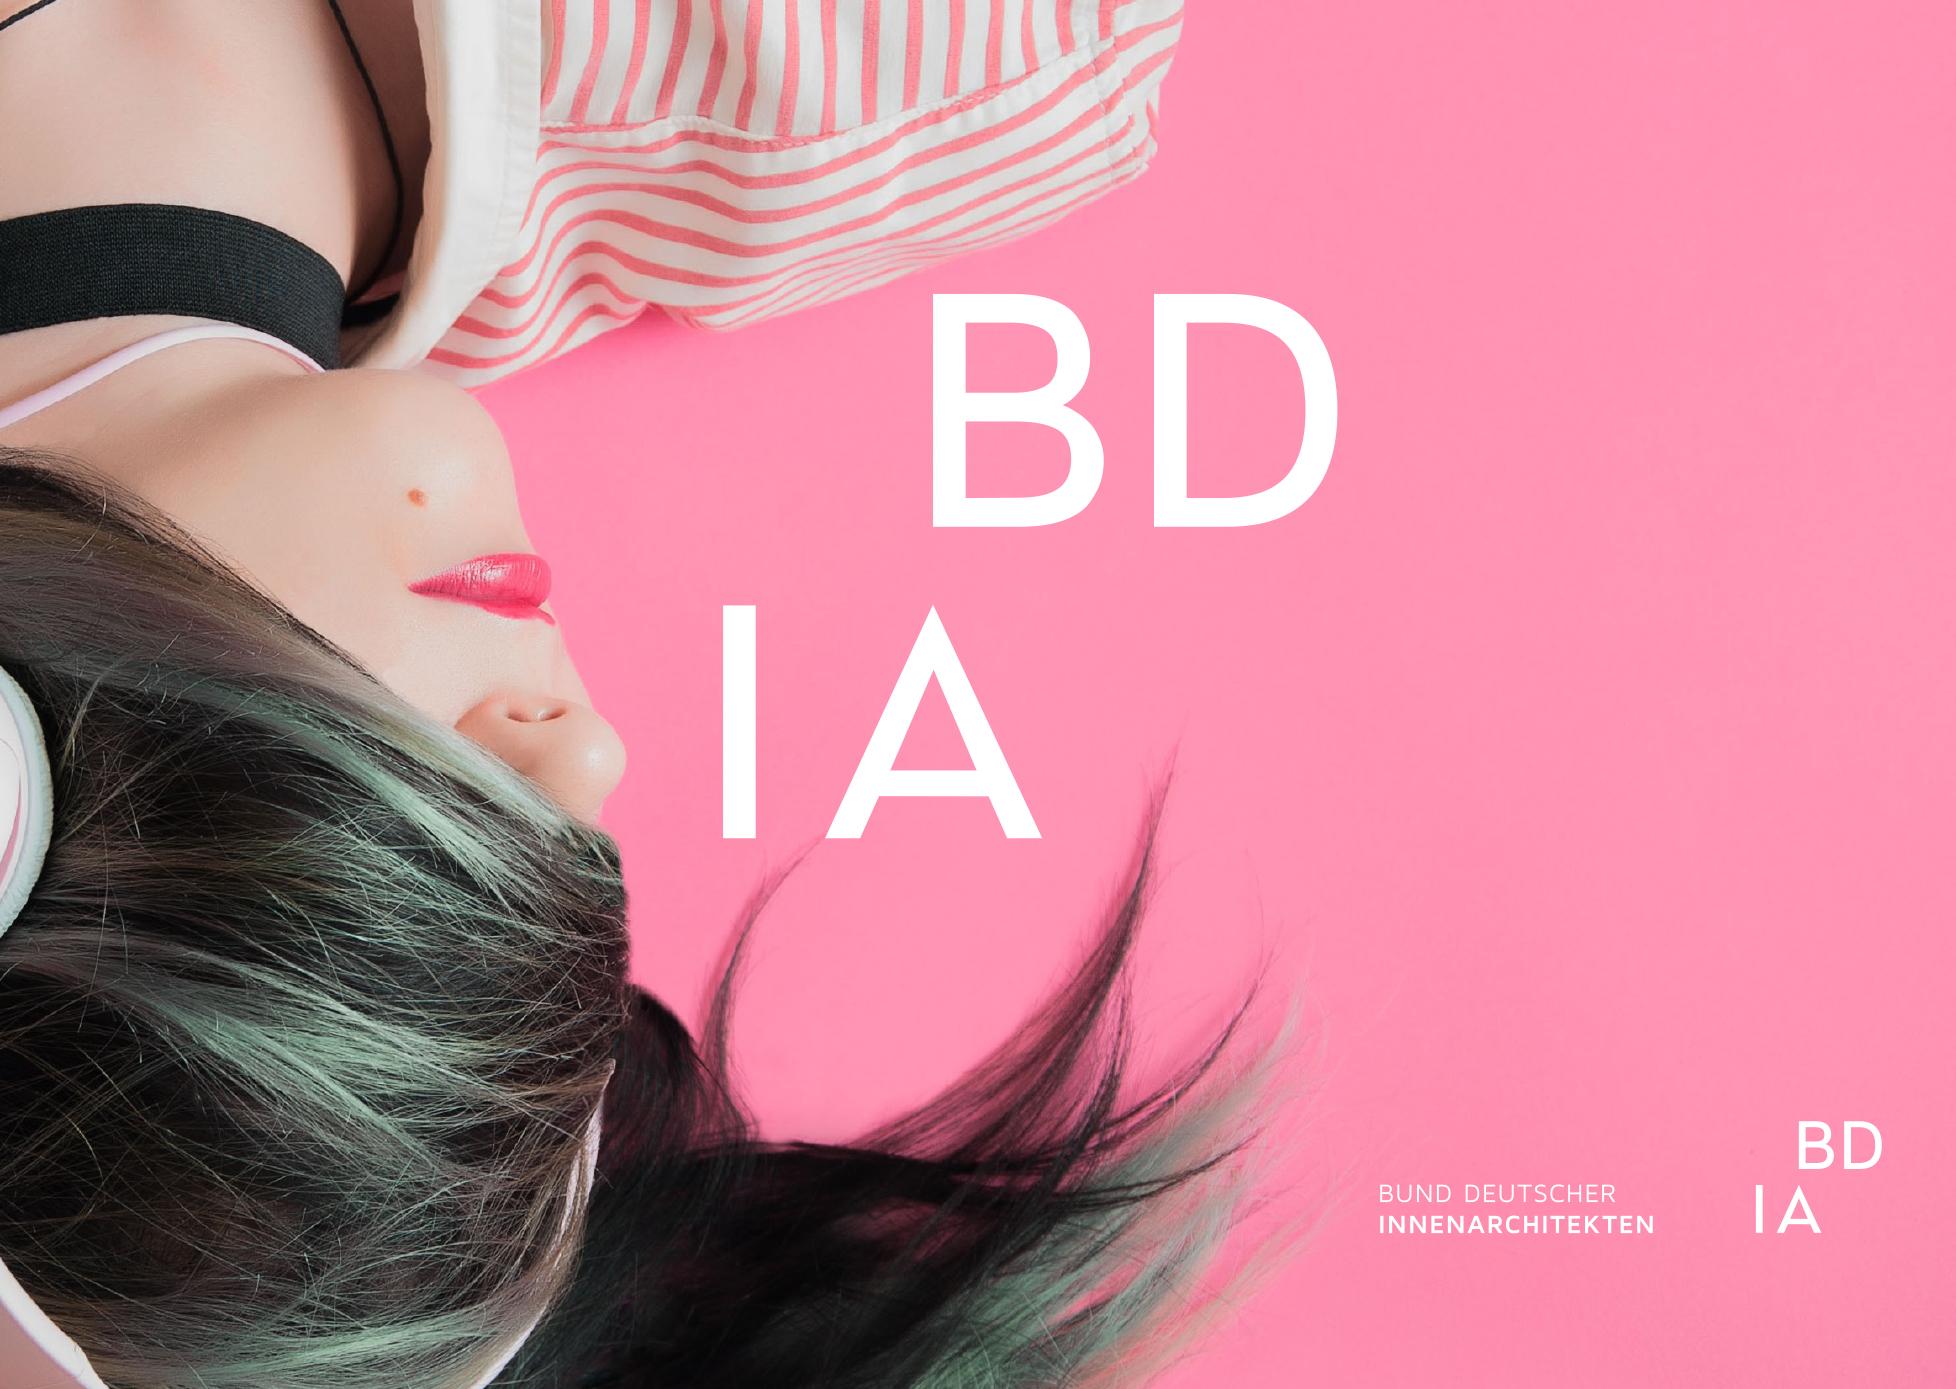 BDIA Revolution